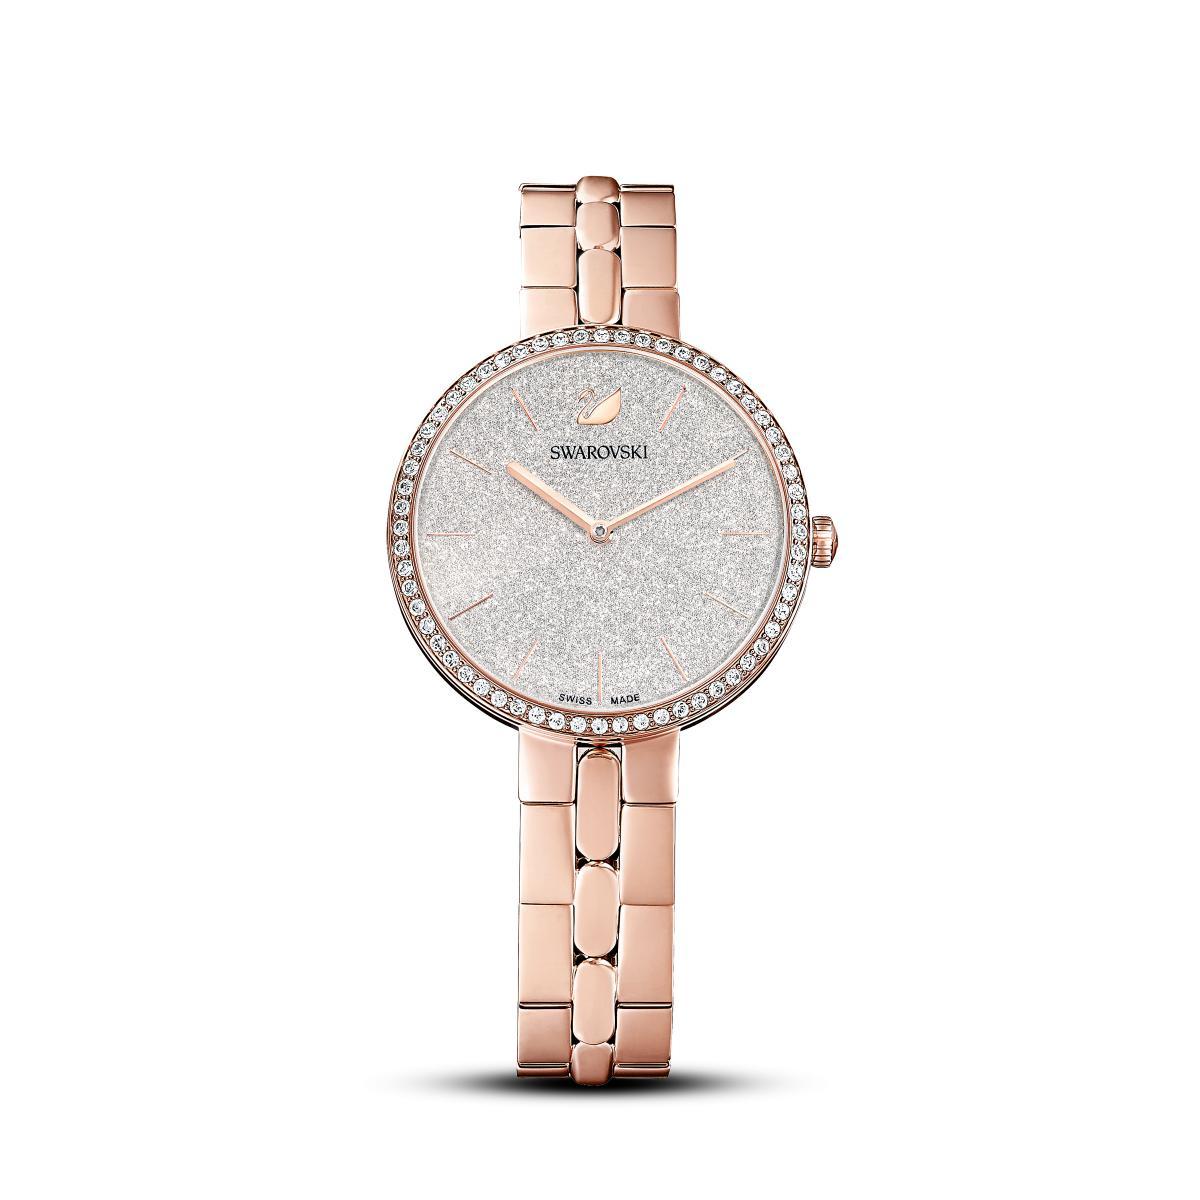 MONTRES 5517803 - COSMOPOLITAN - Swarovski montres - Modalova